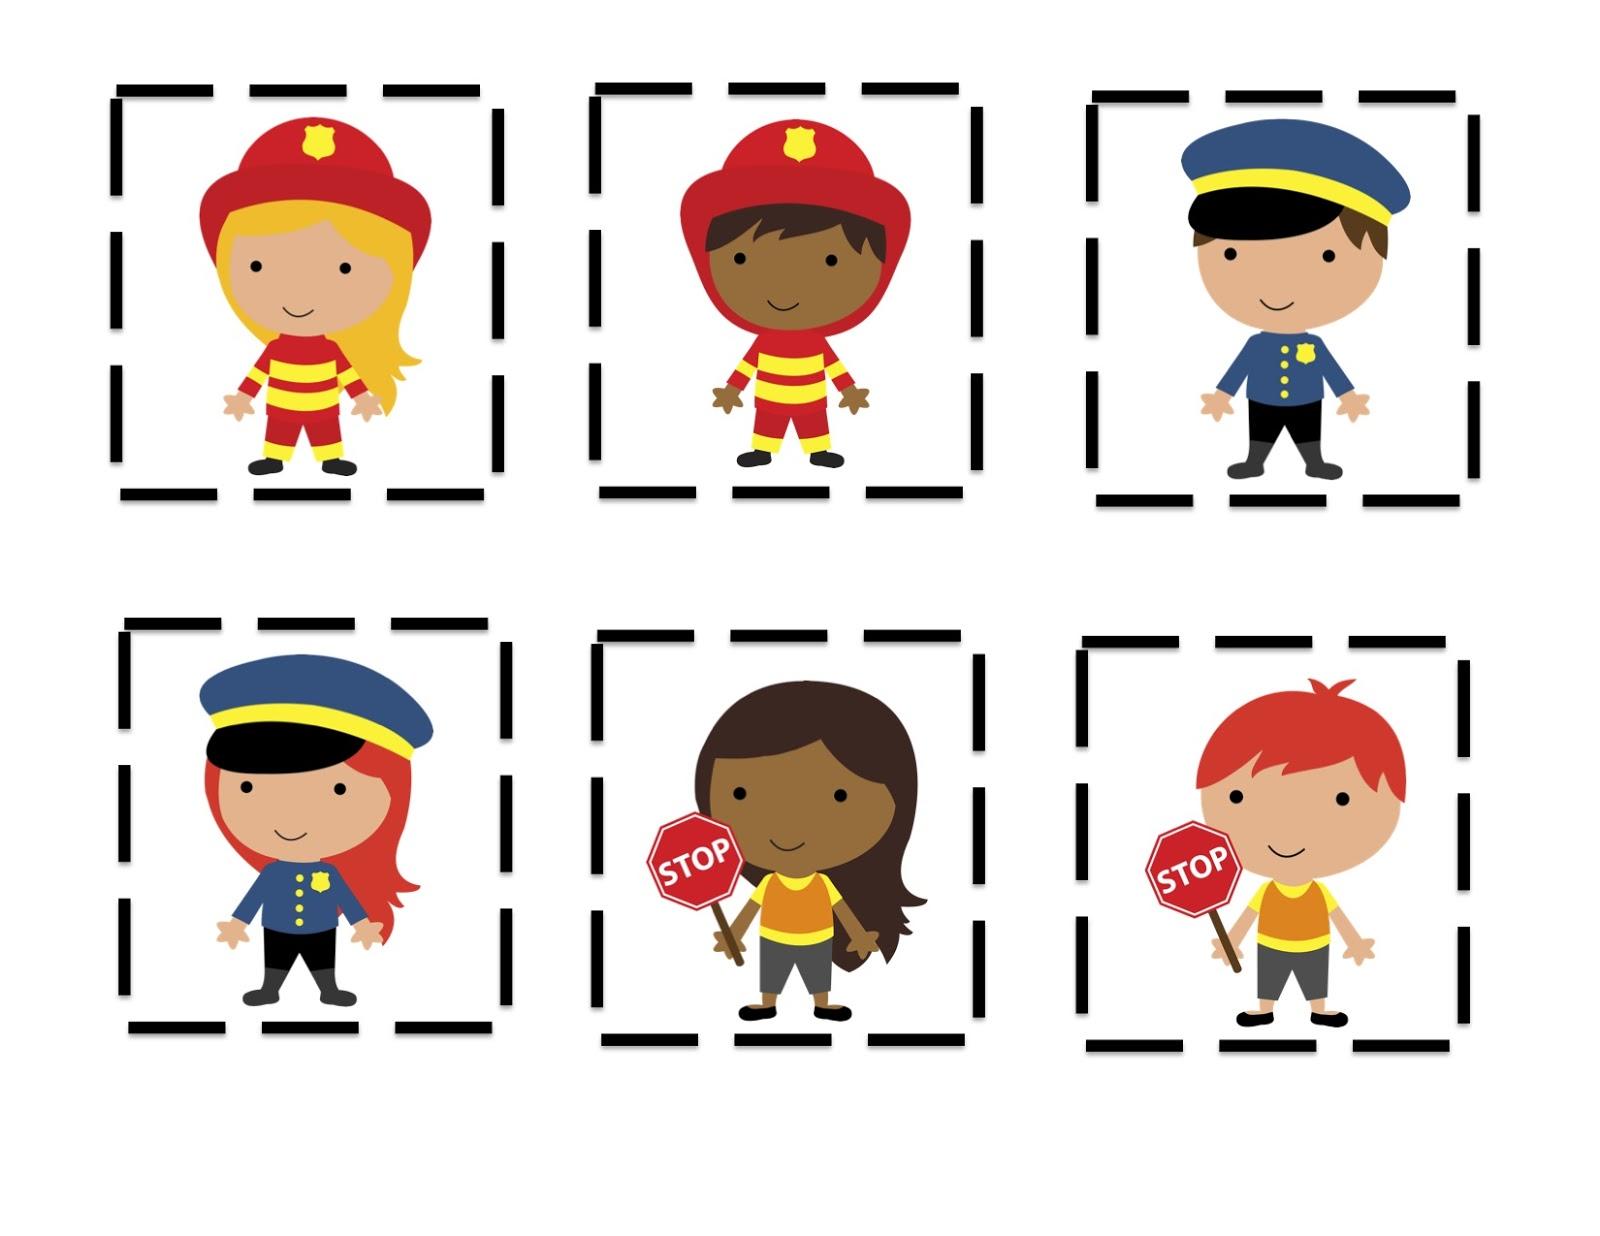 preschool helpers images reverse search